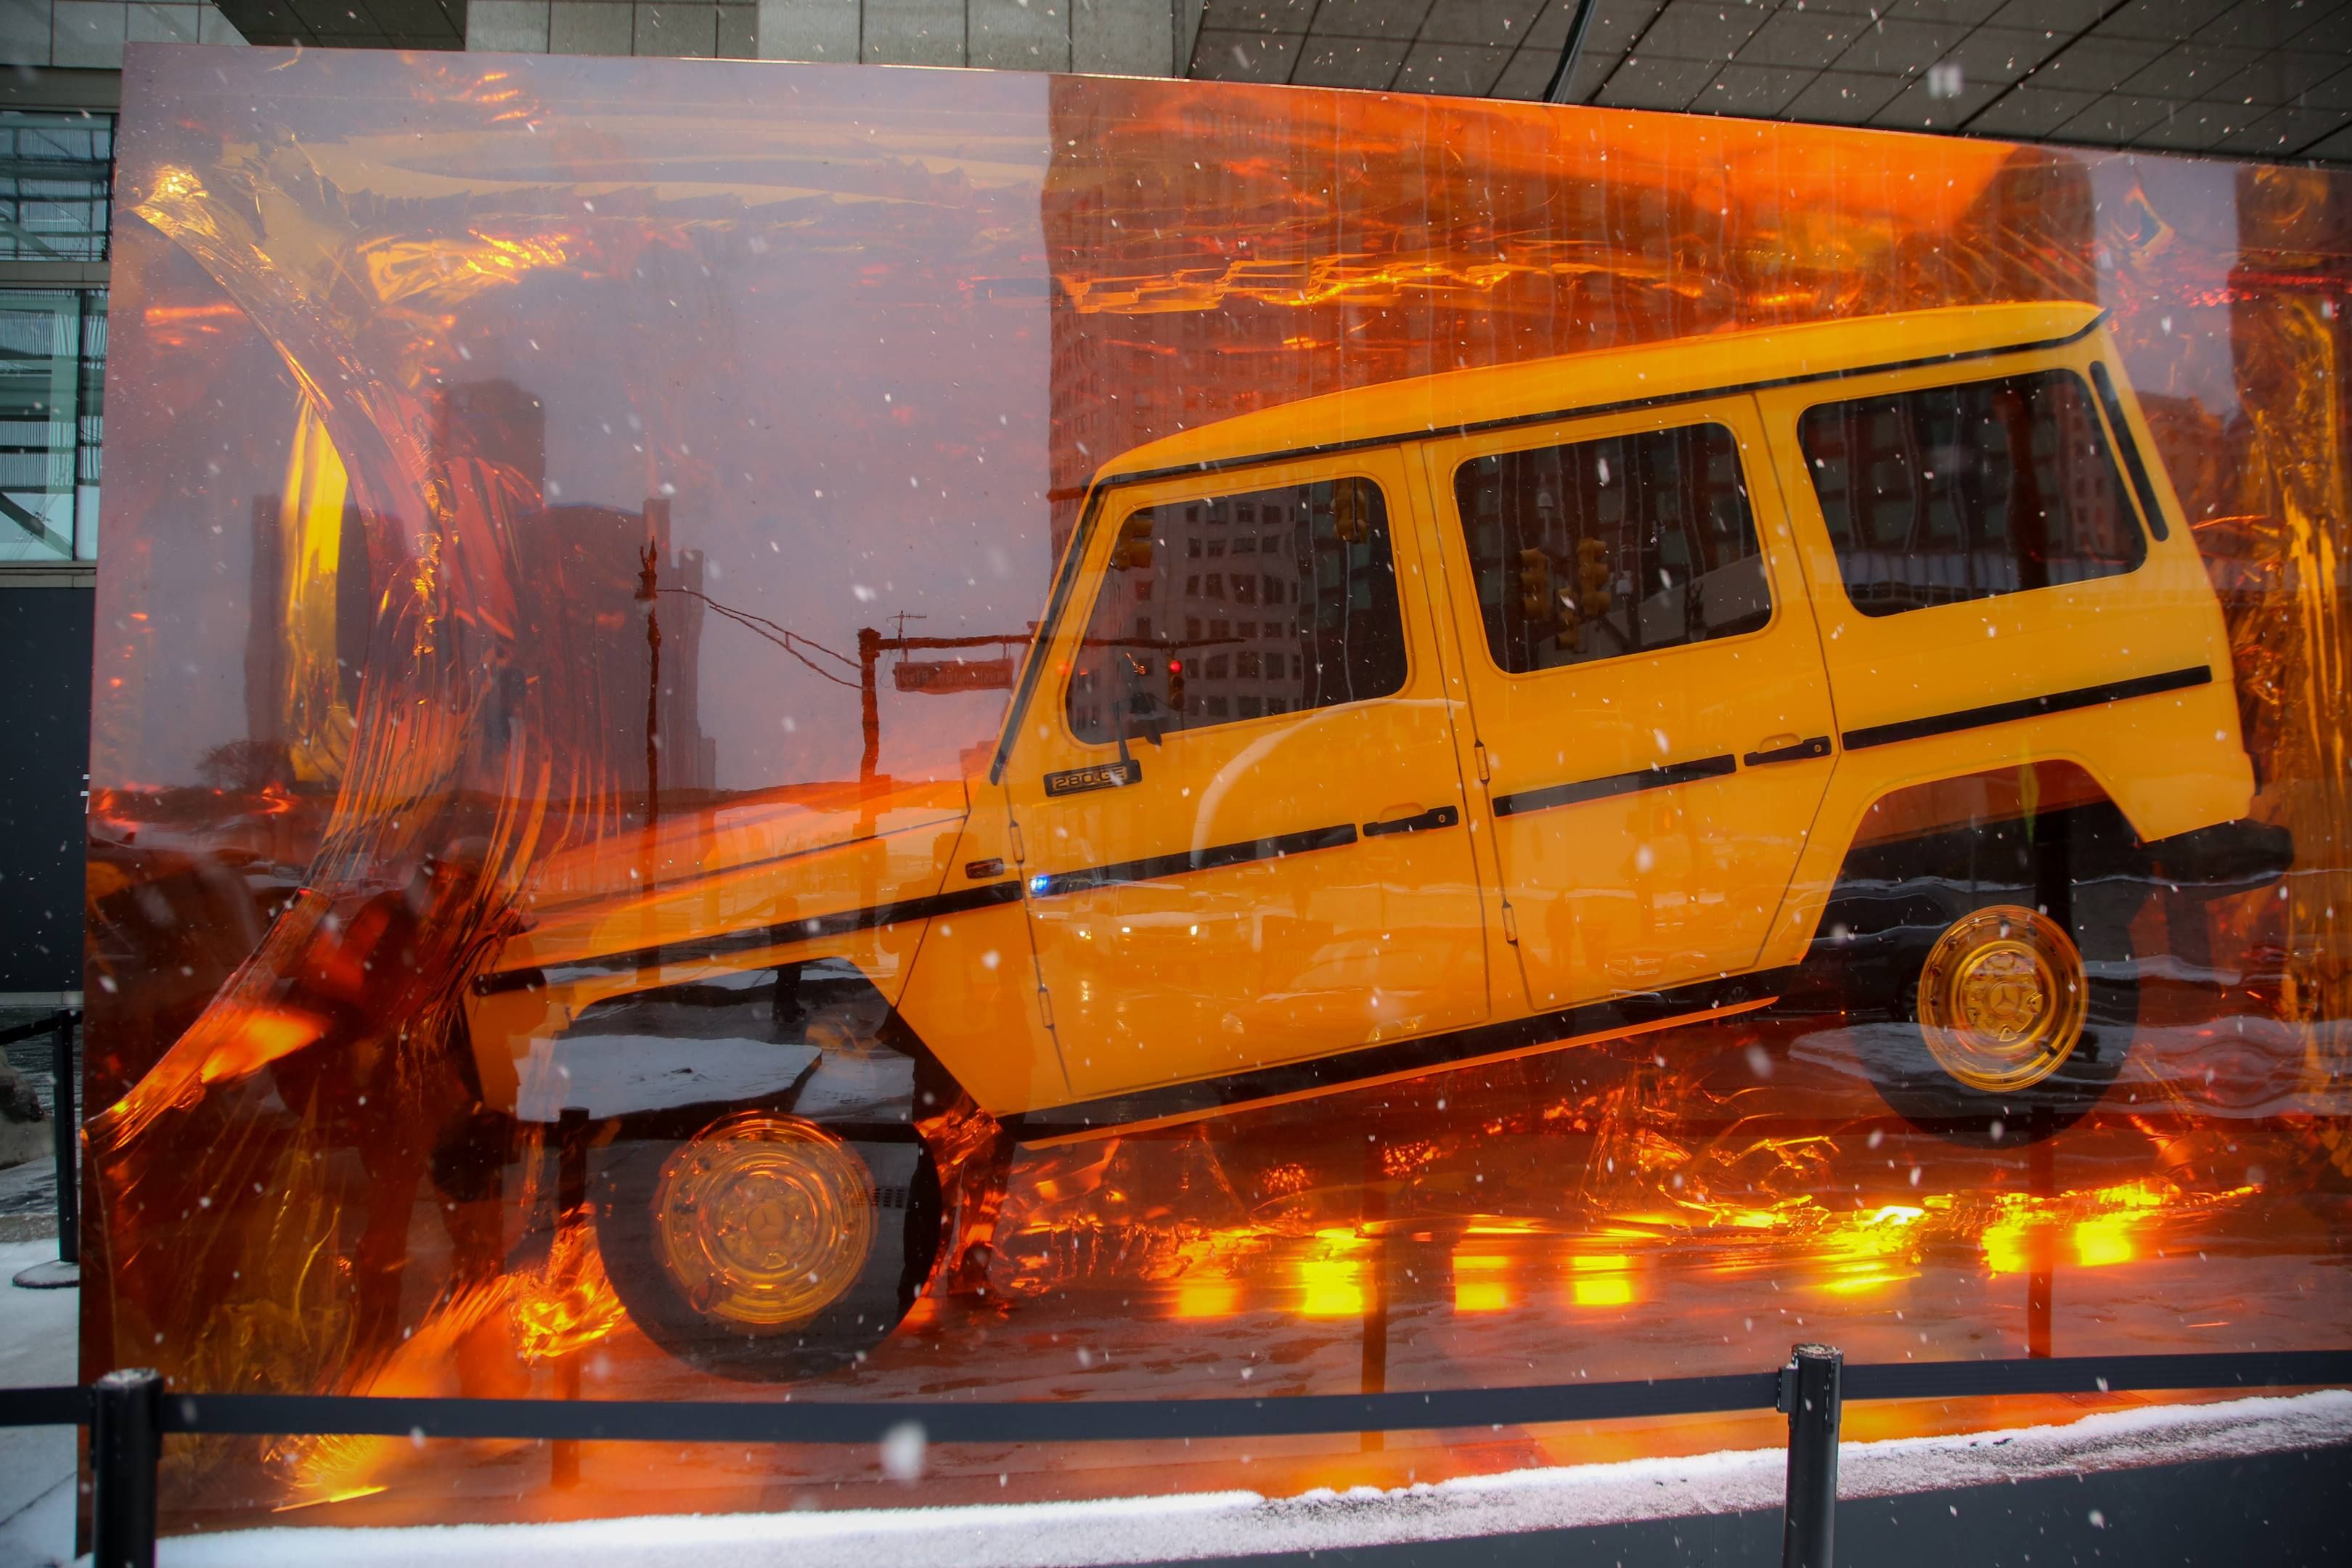 1979 Mercdes-Benz 280 GE cast in amber